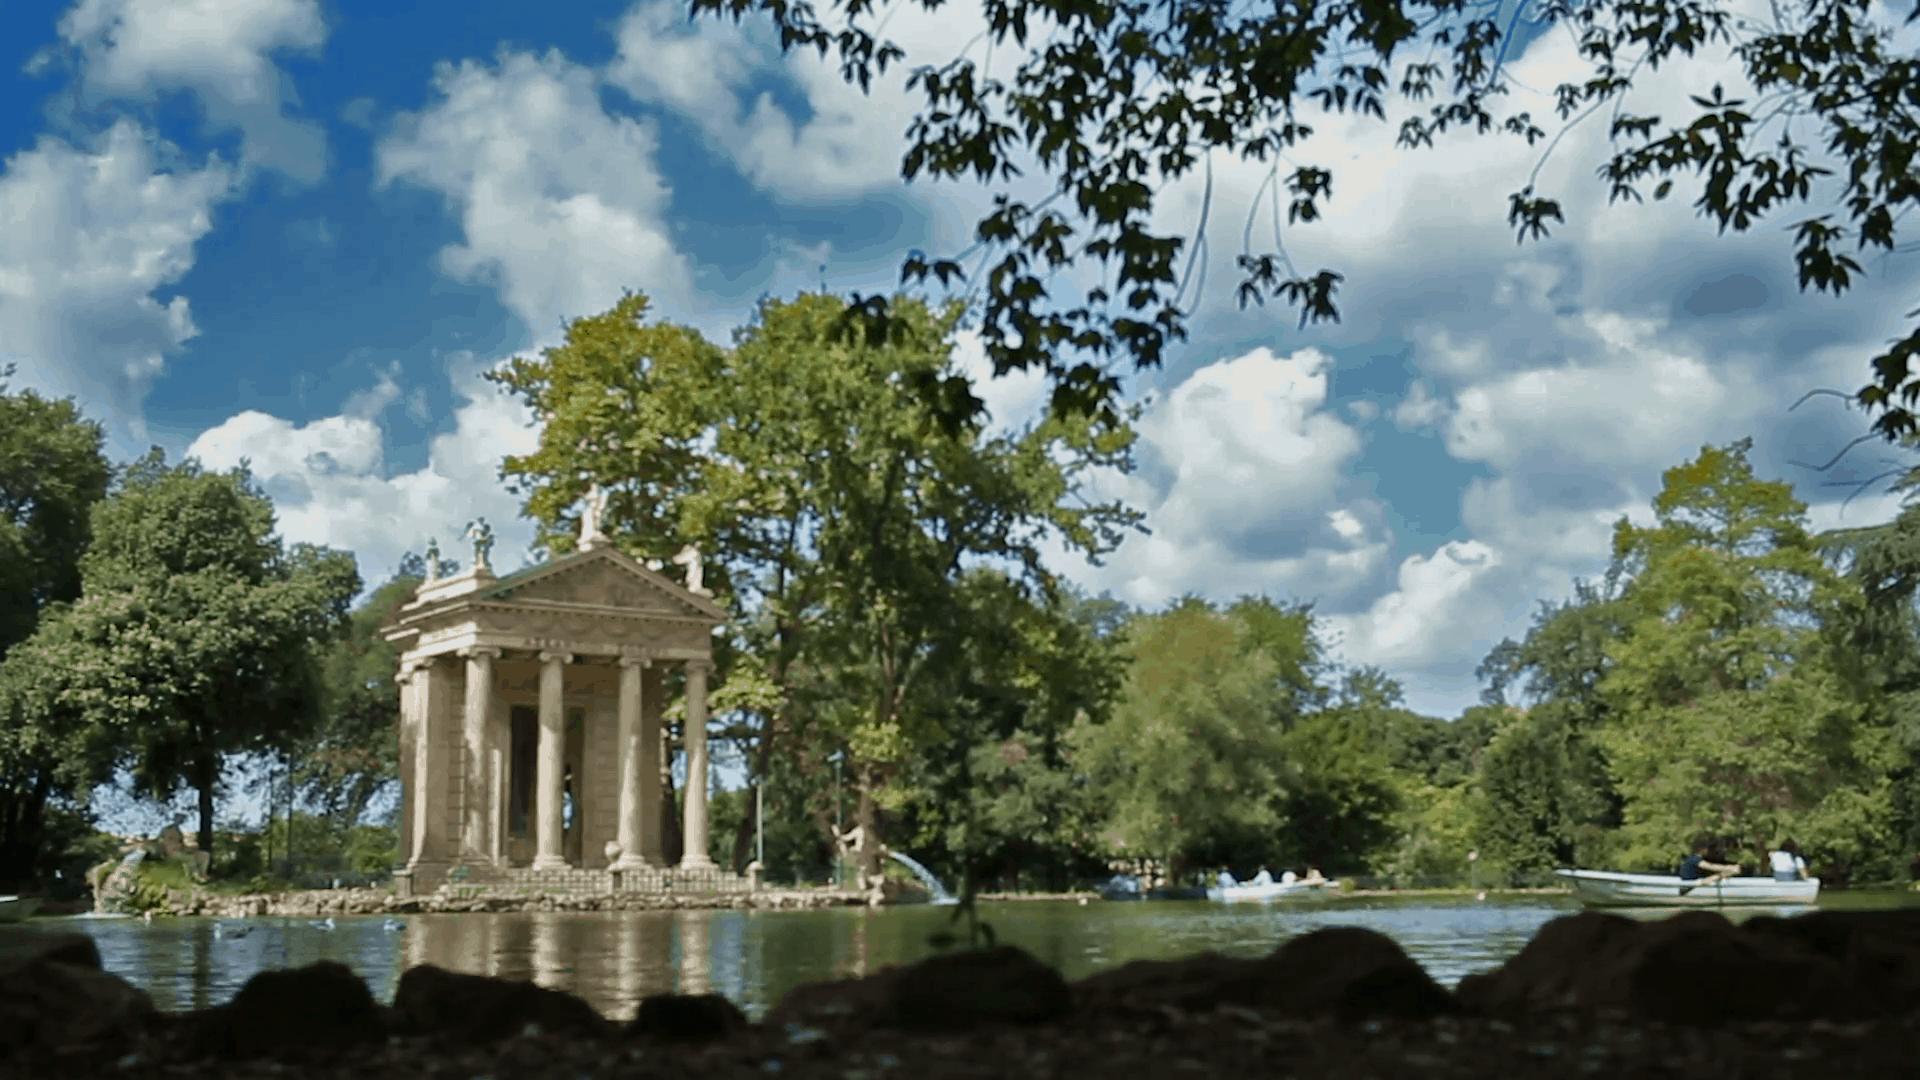 حديقة villa borghese